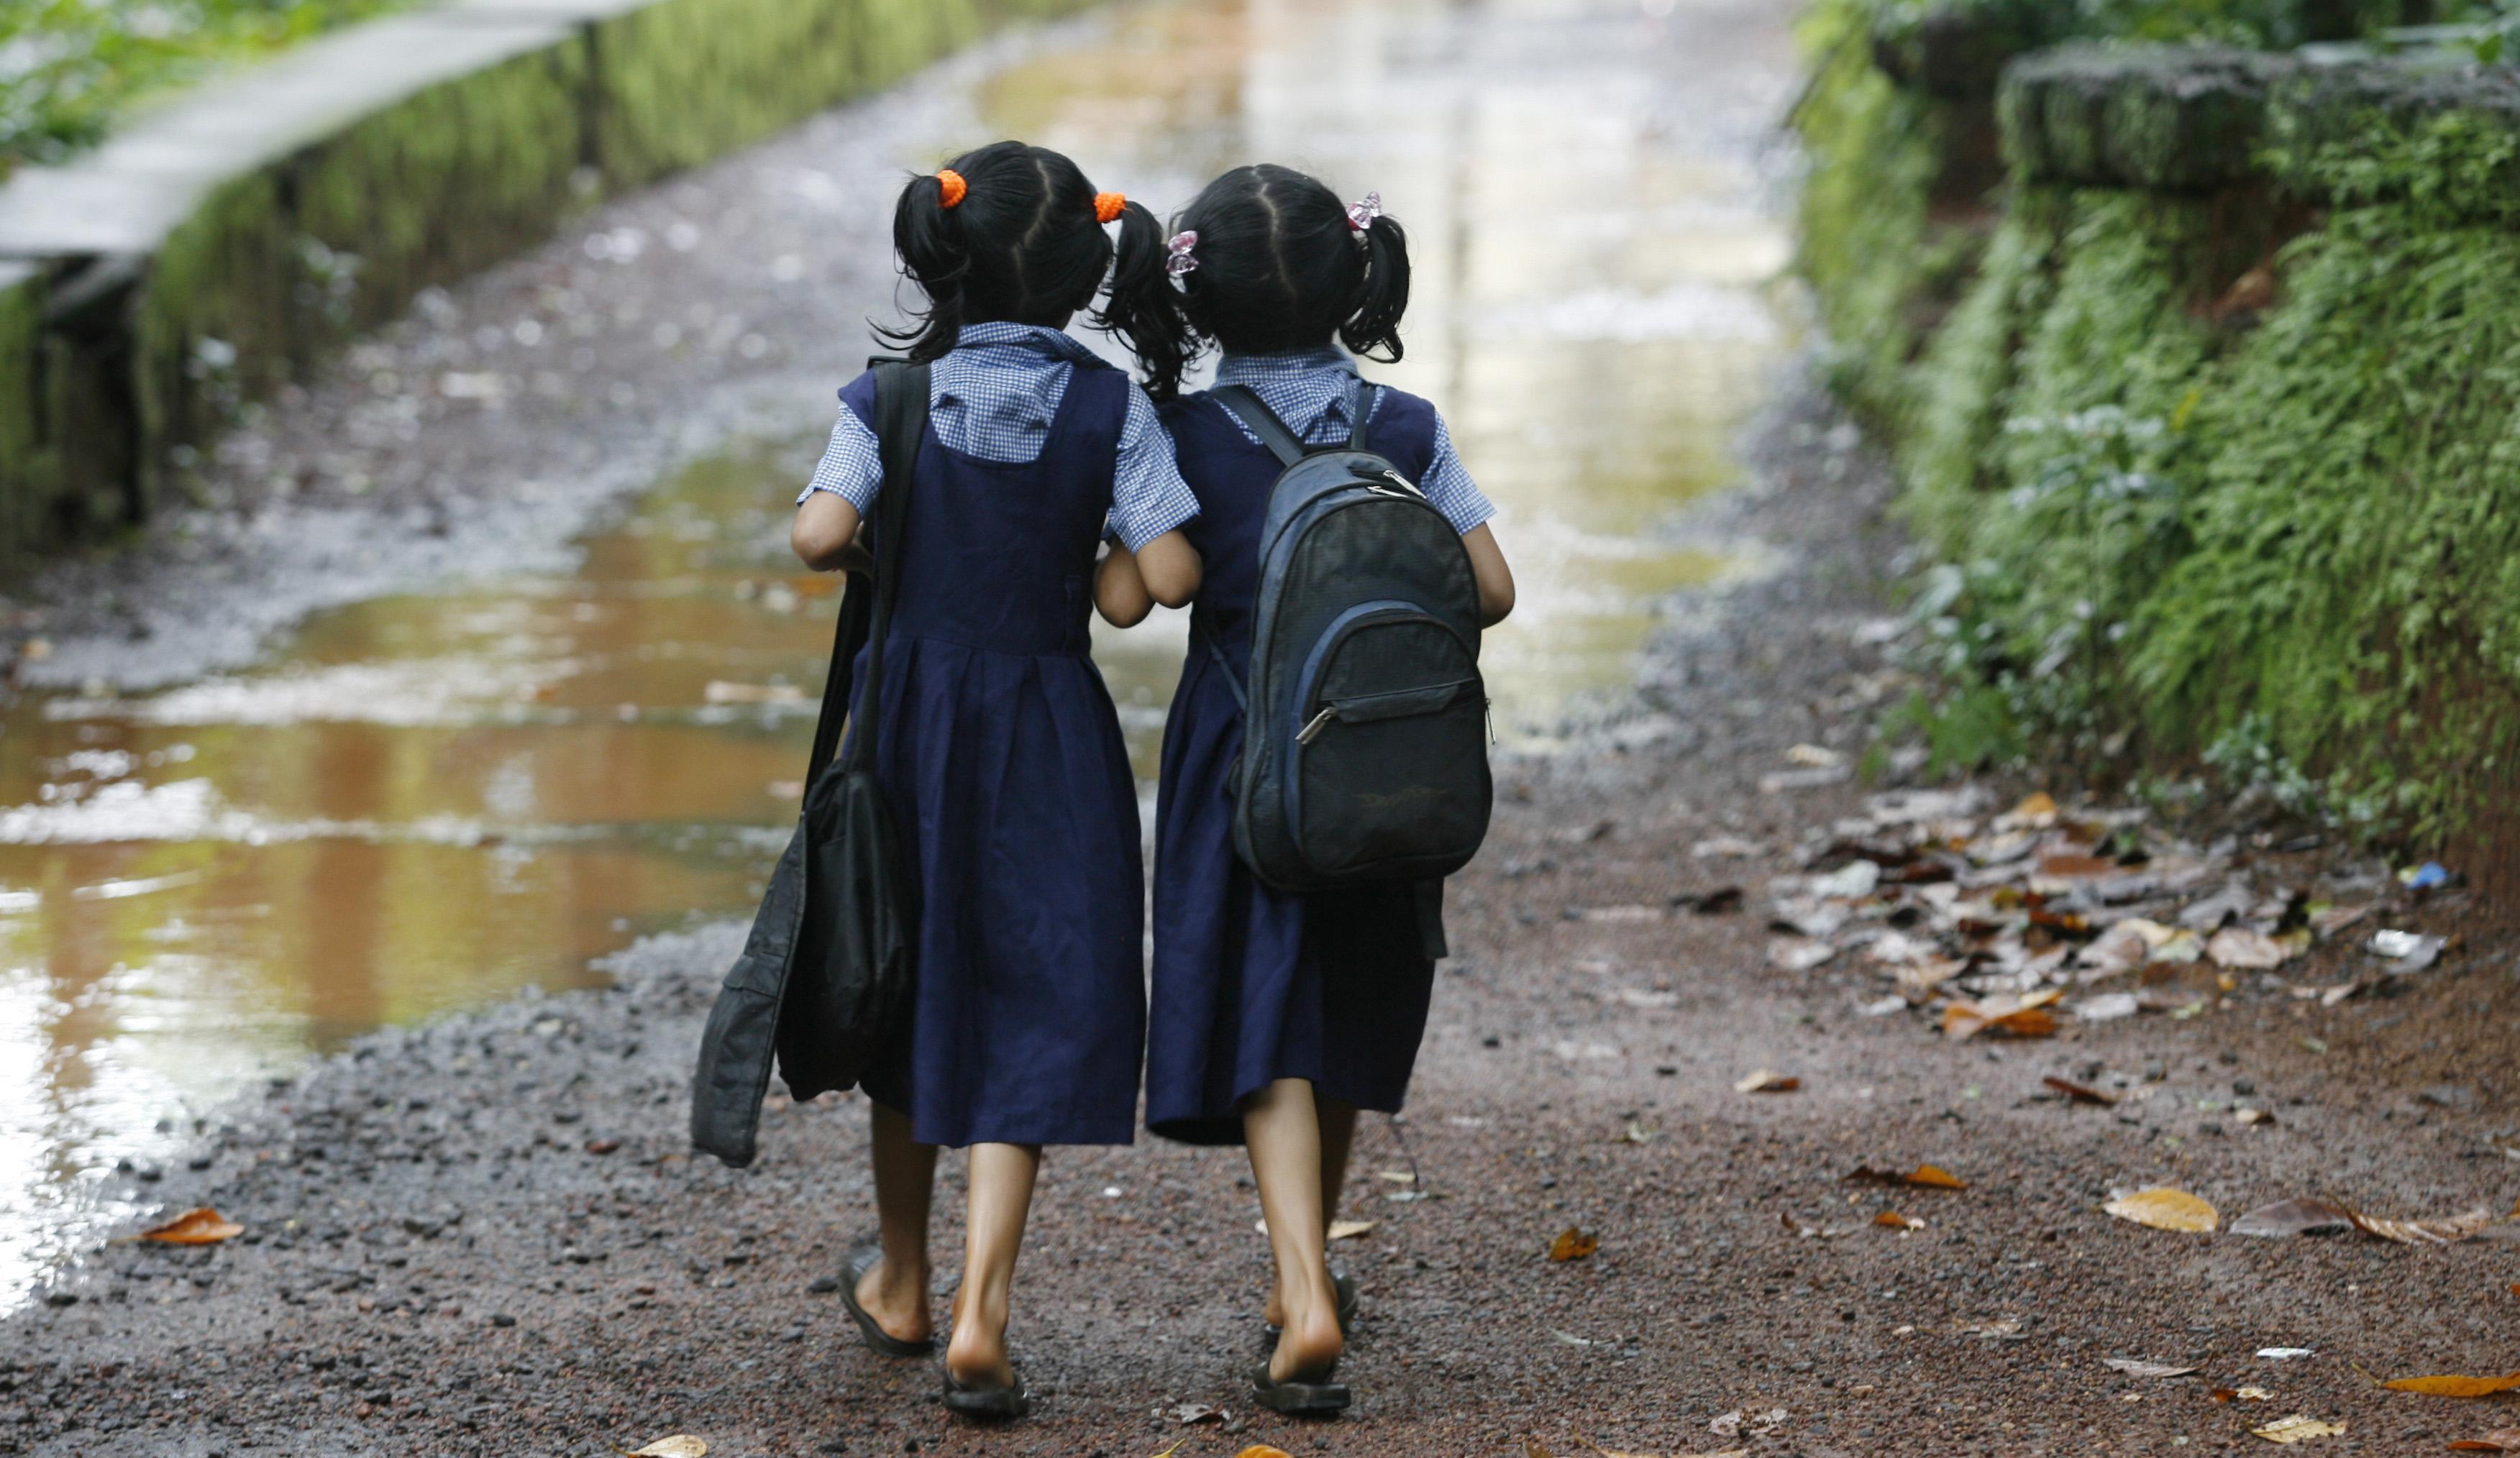 Twin girls walk to their school in Kodinji village in the southern Indian city of Kerala